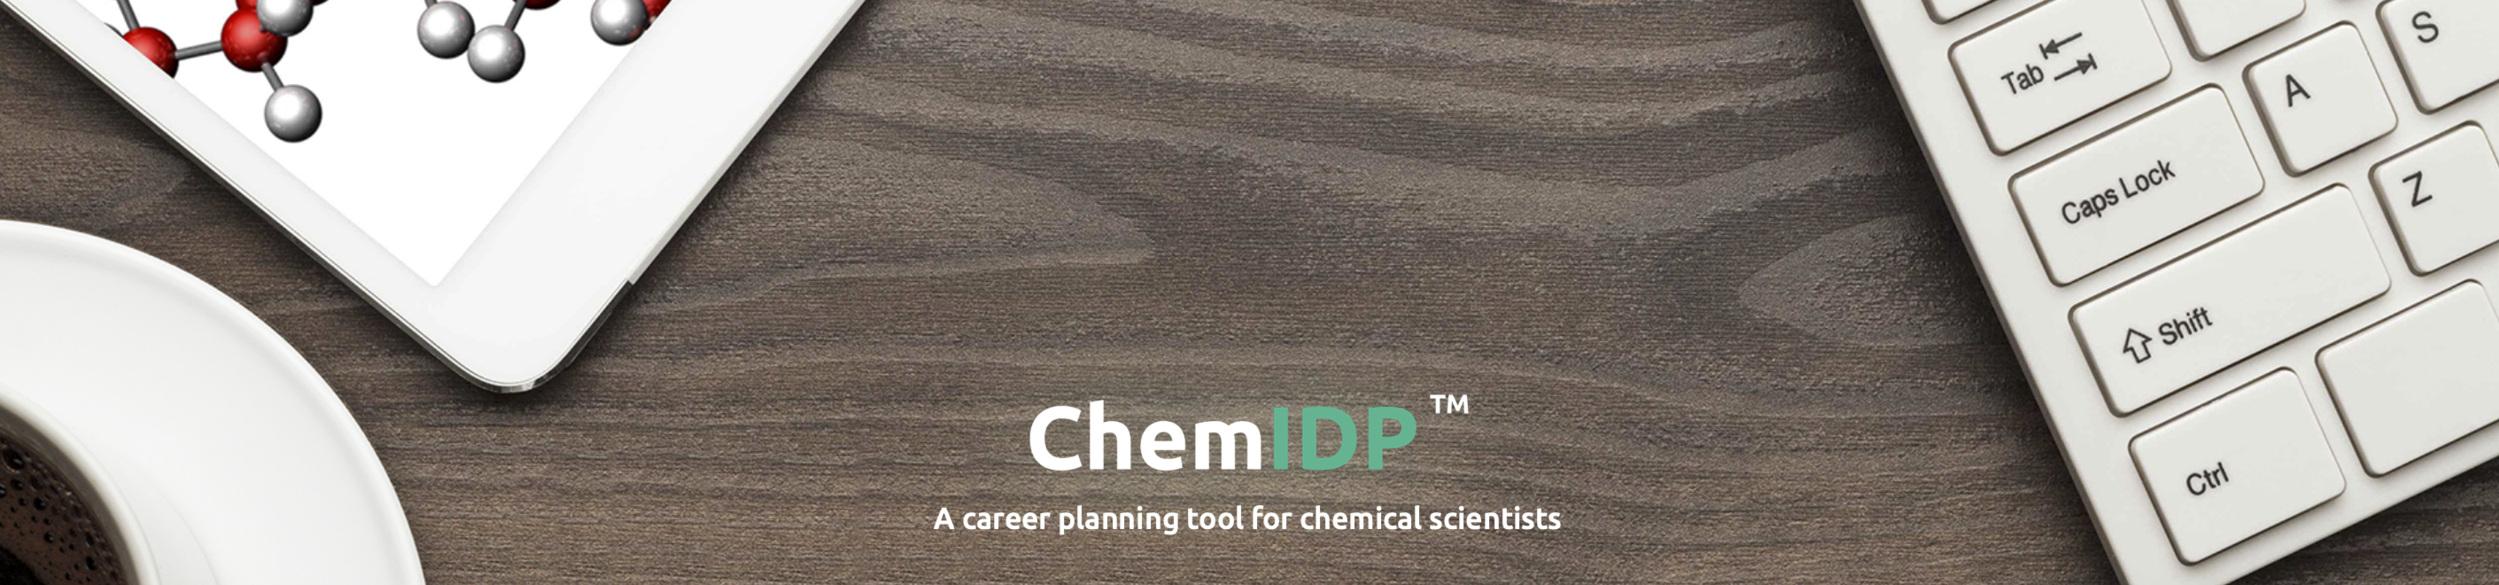 ChemIDP